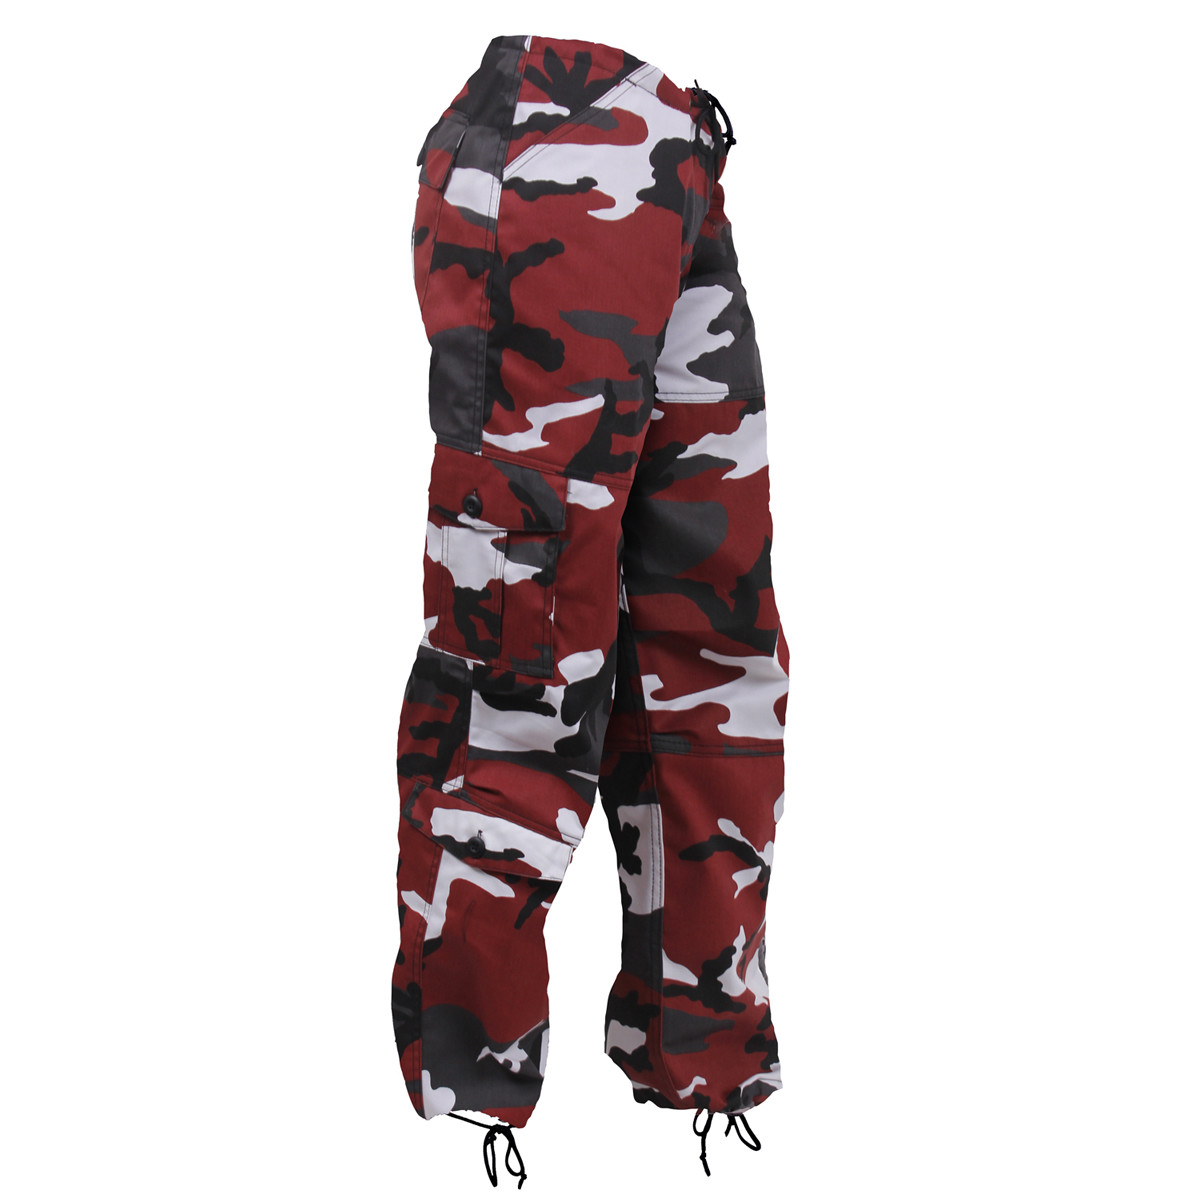 42fc6fd2e2afae Shop Womens Red Camo Fatigue Pants - Fatigues Army Navy Gear